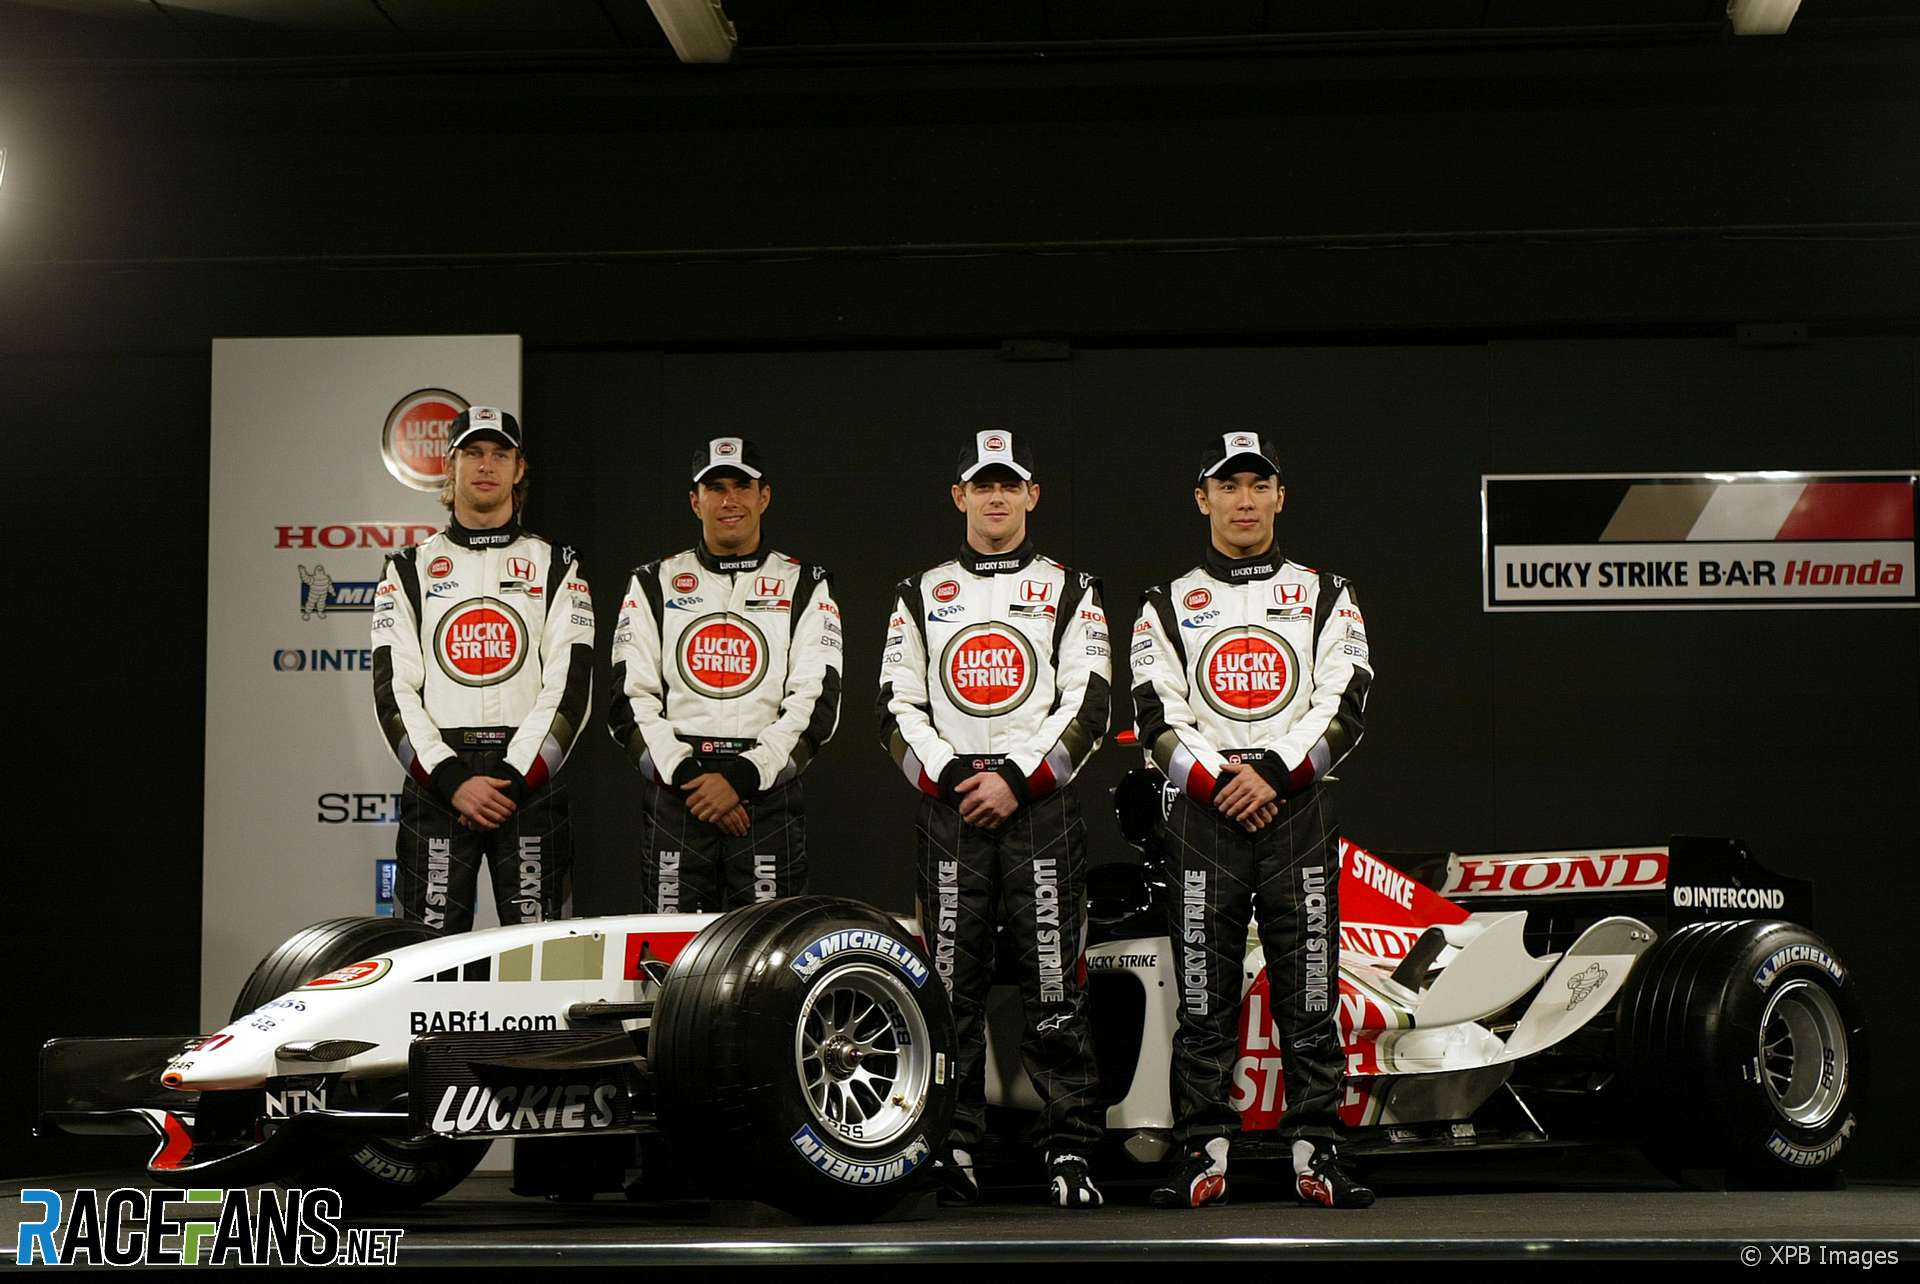 Jenson Button, Enrique Bernoldi, Anthony Davidson, Takuma Sato, BAR Honda 007 Launch, Circuit de Catalunya, 2005